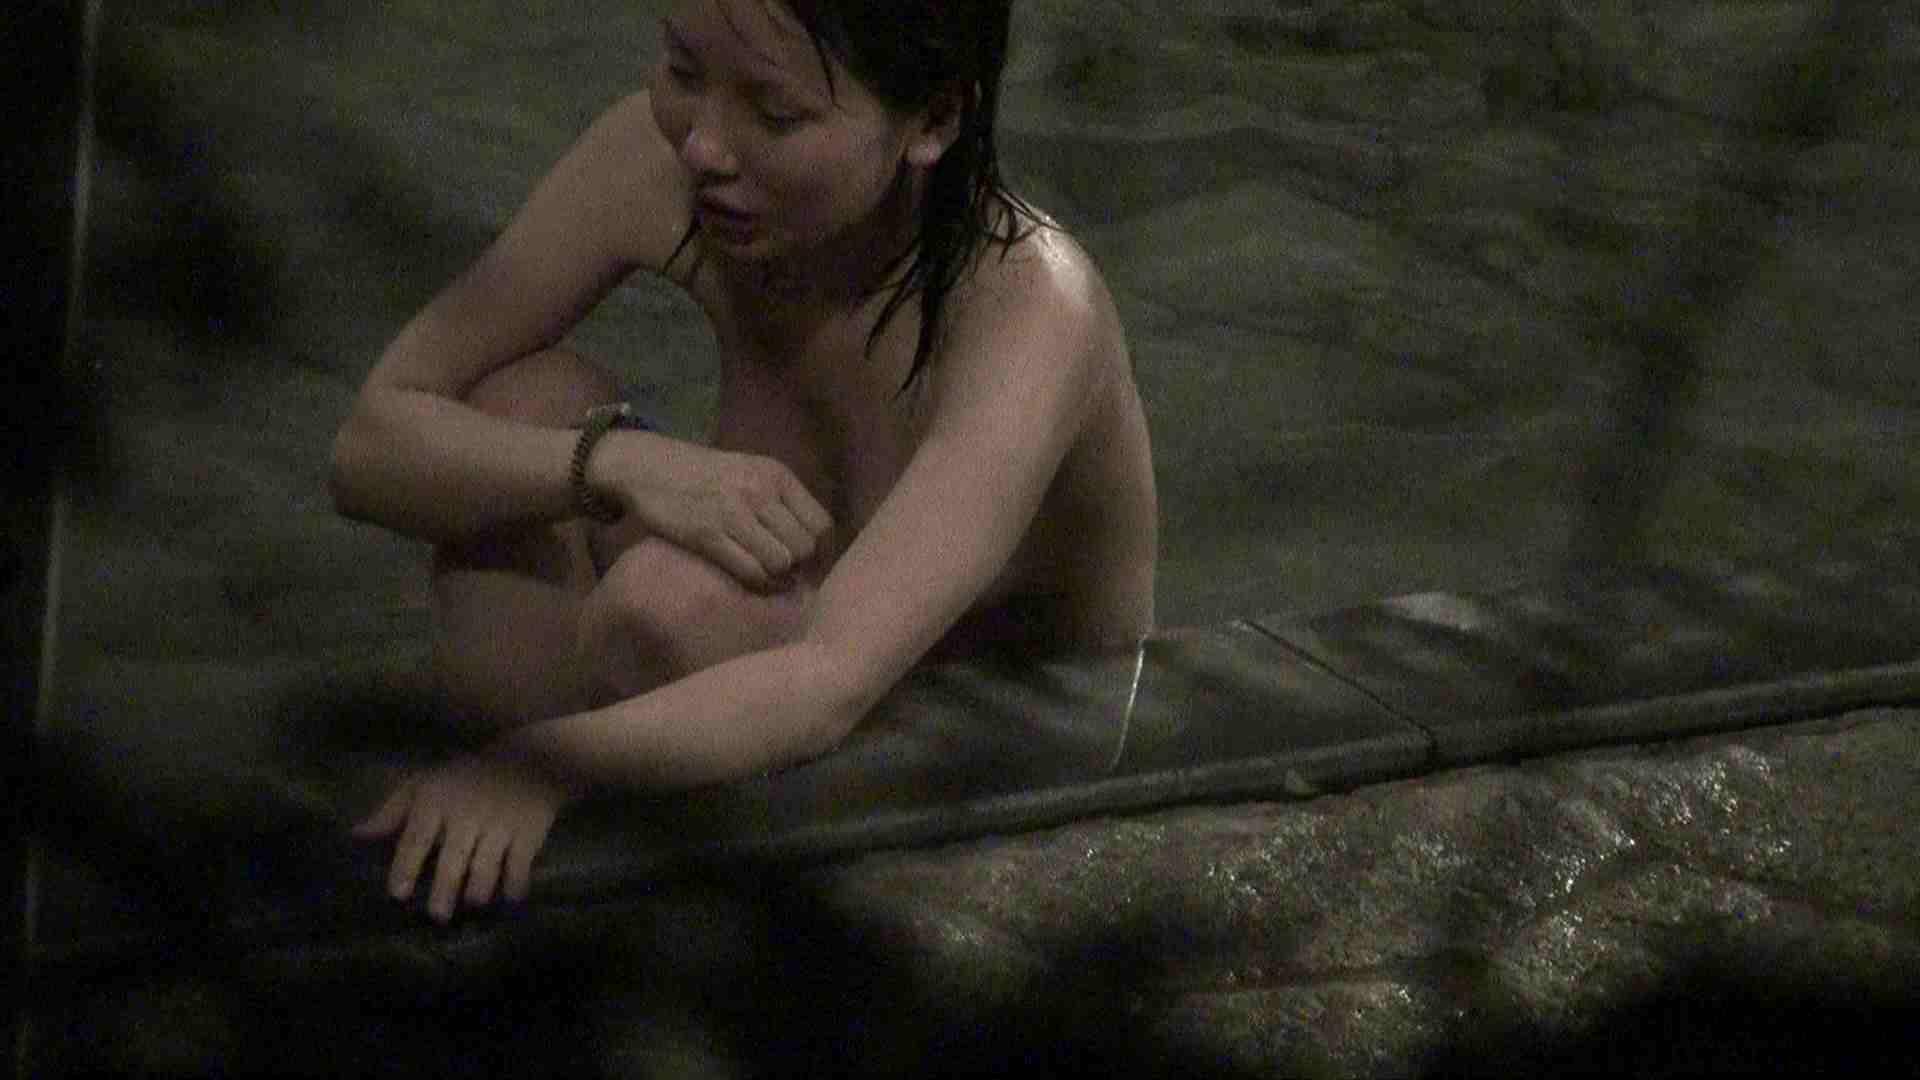 Aquaな露天風呂Vol.363 盗撮 | OLセックス  90画像 64